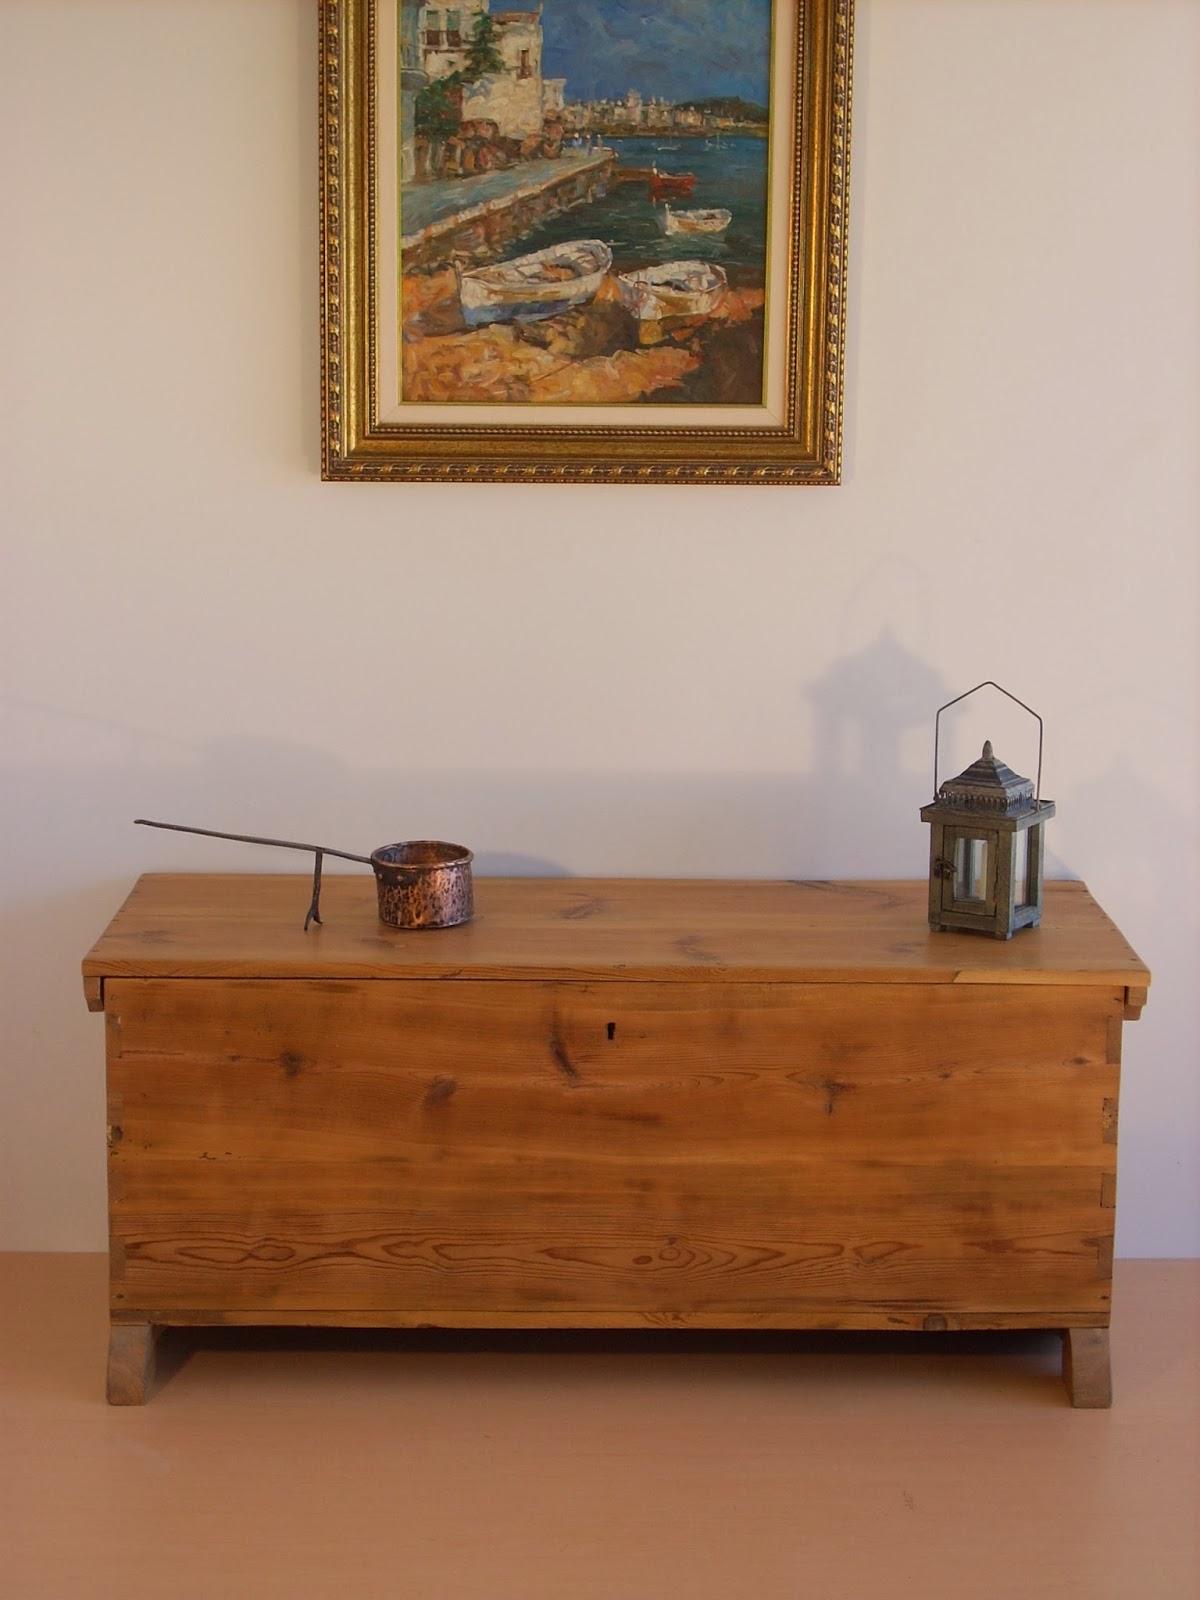 Como restaurar muebles restauracin de muebles antiguos - Como limpiar muebles de madera antiguos ...